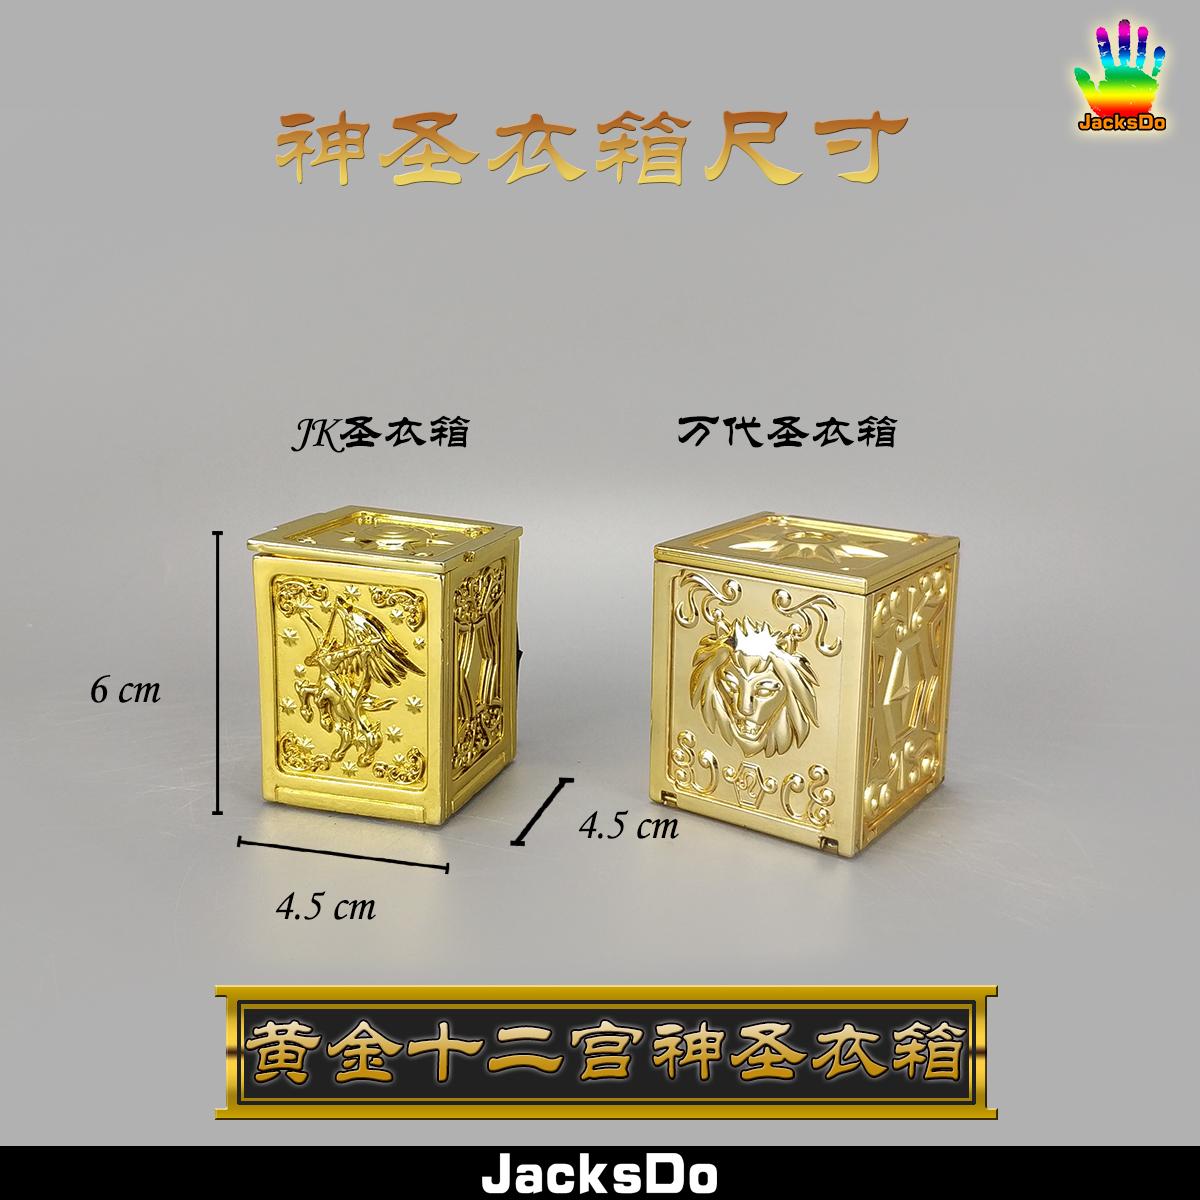 JacksDo_box_gold_kamu_roki_inask_031.jpg